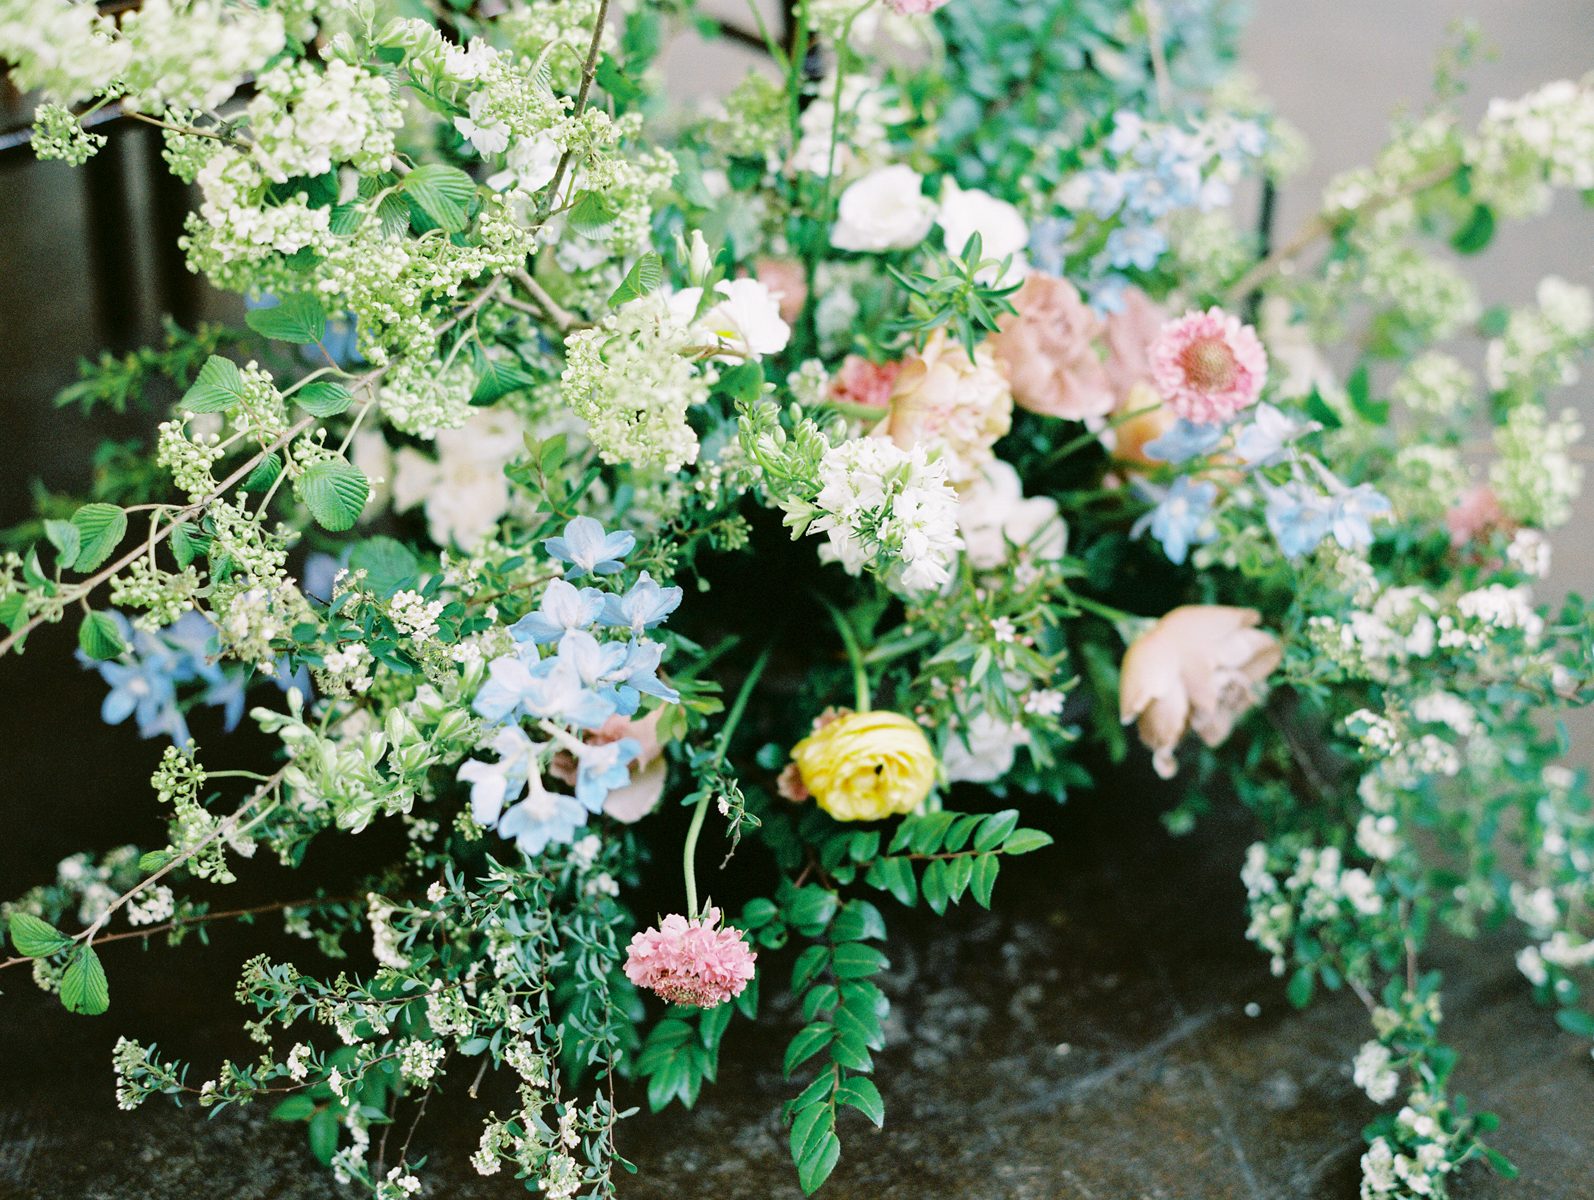 Foundry-At-Puritan-Mill-wedding-photos-venue-atlanta-fine-art-film-photographer32.JPG